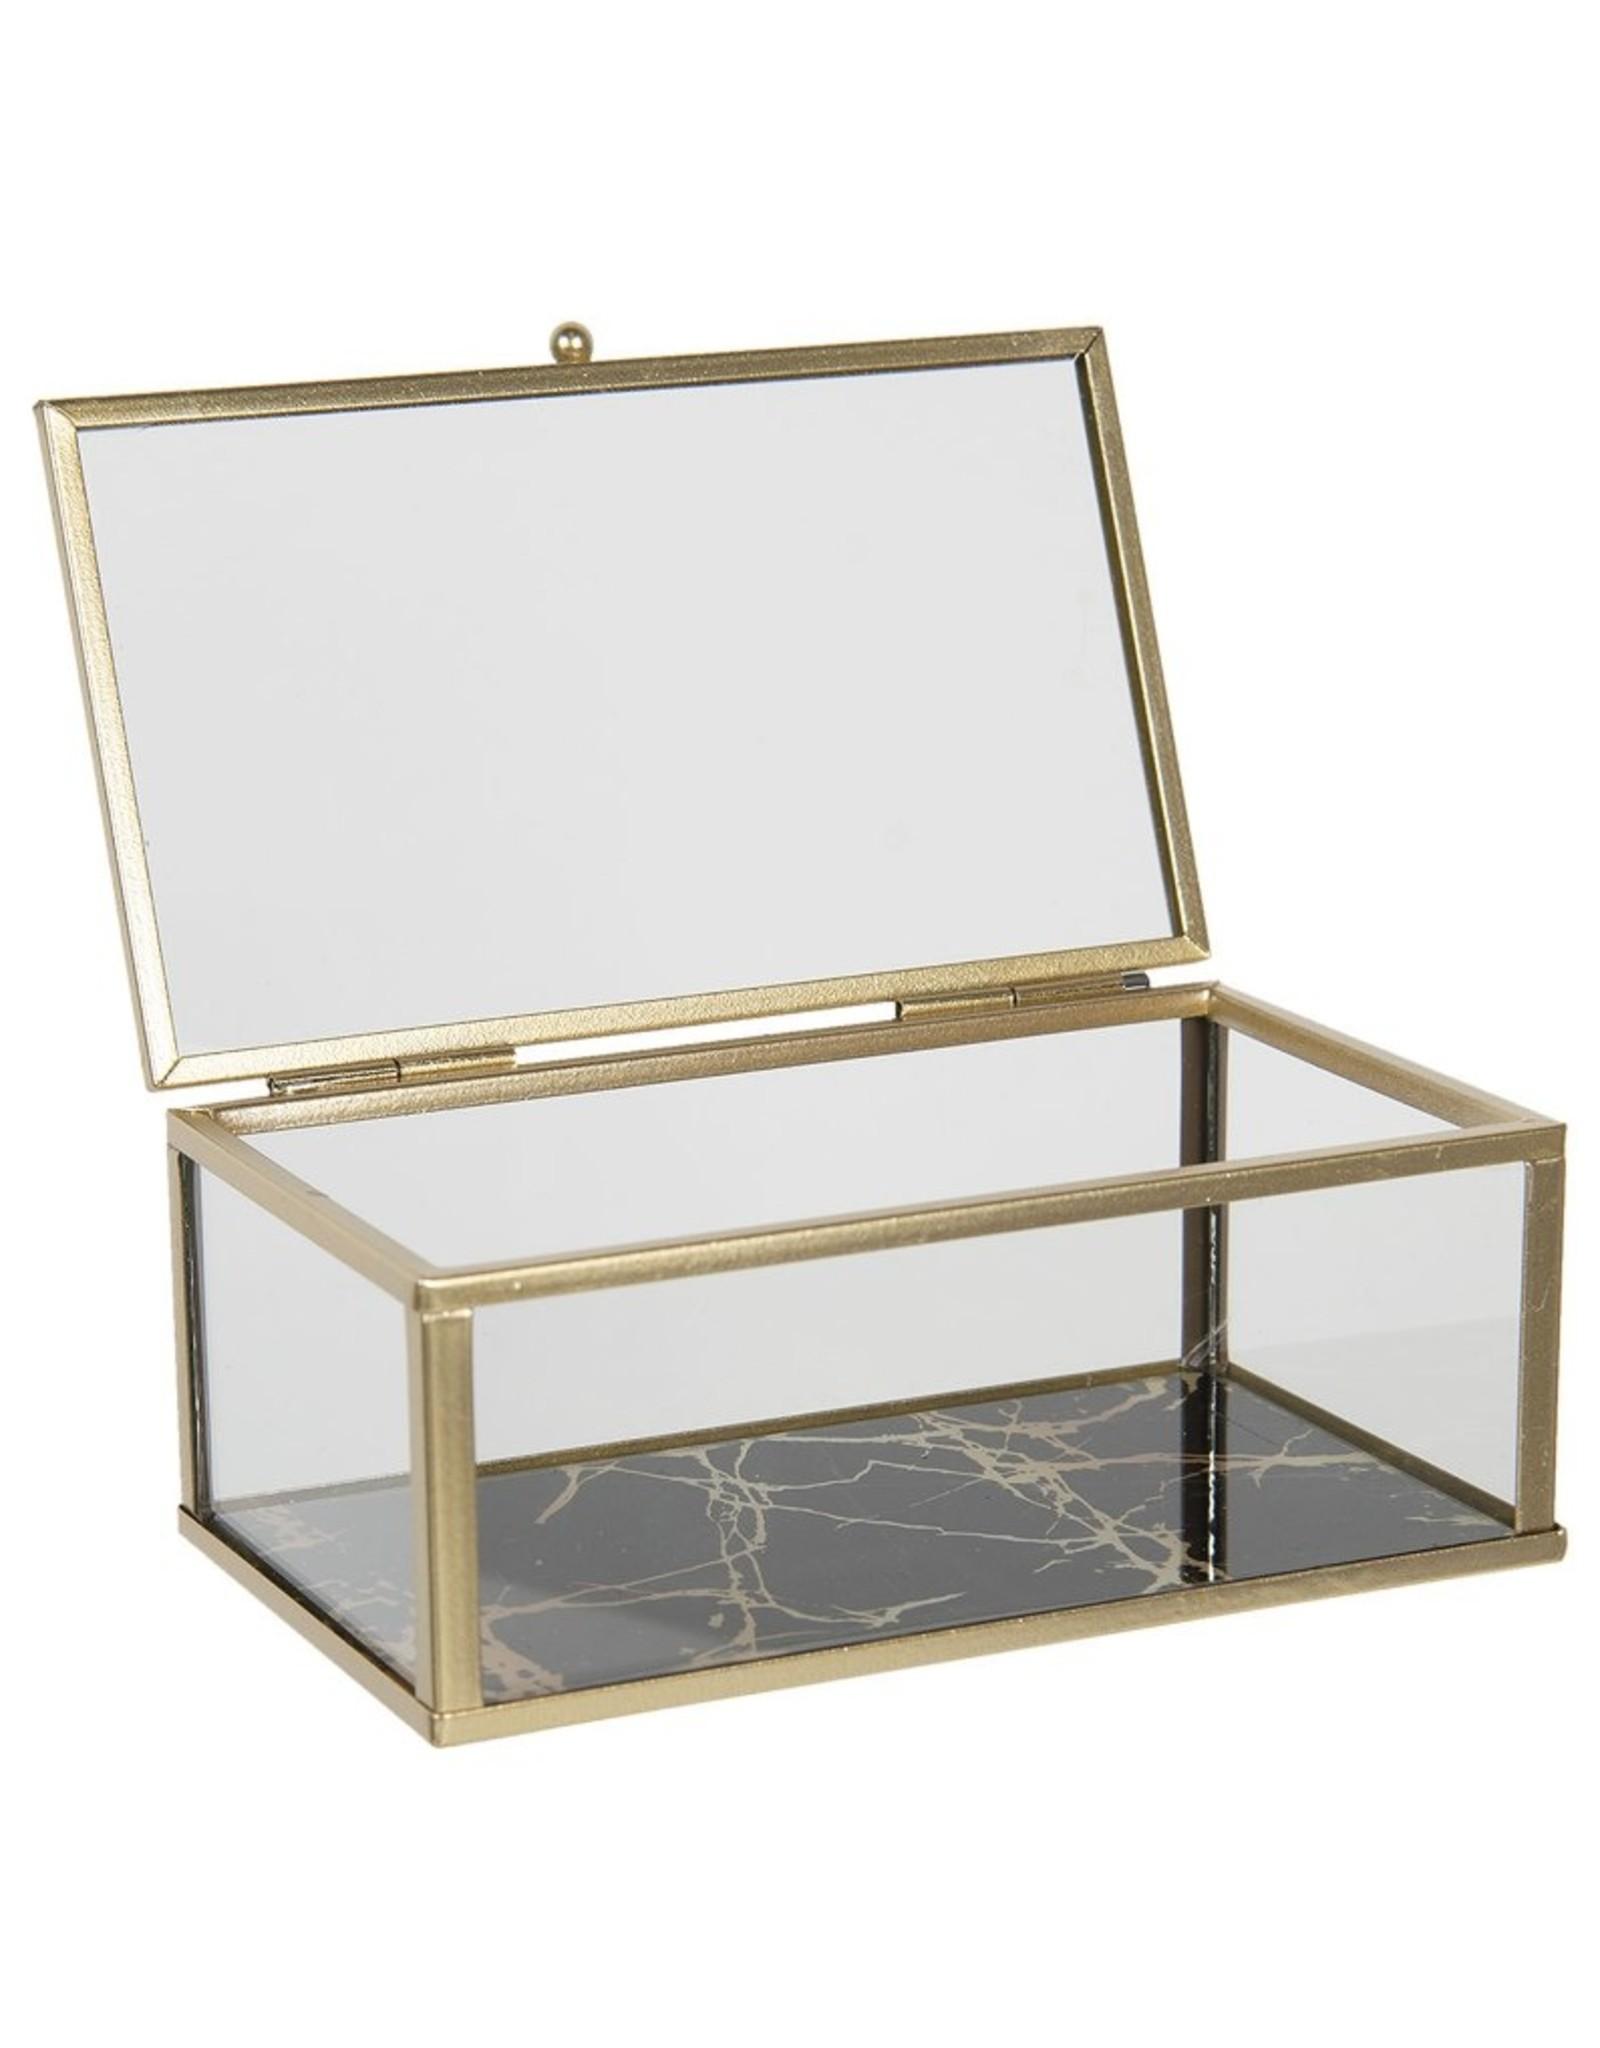 Glazen juwelendoosje Miscellaneous - Glass jewellery box  - presentation box 17x10x7 cm